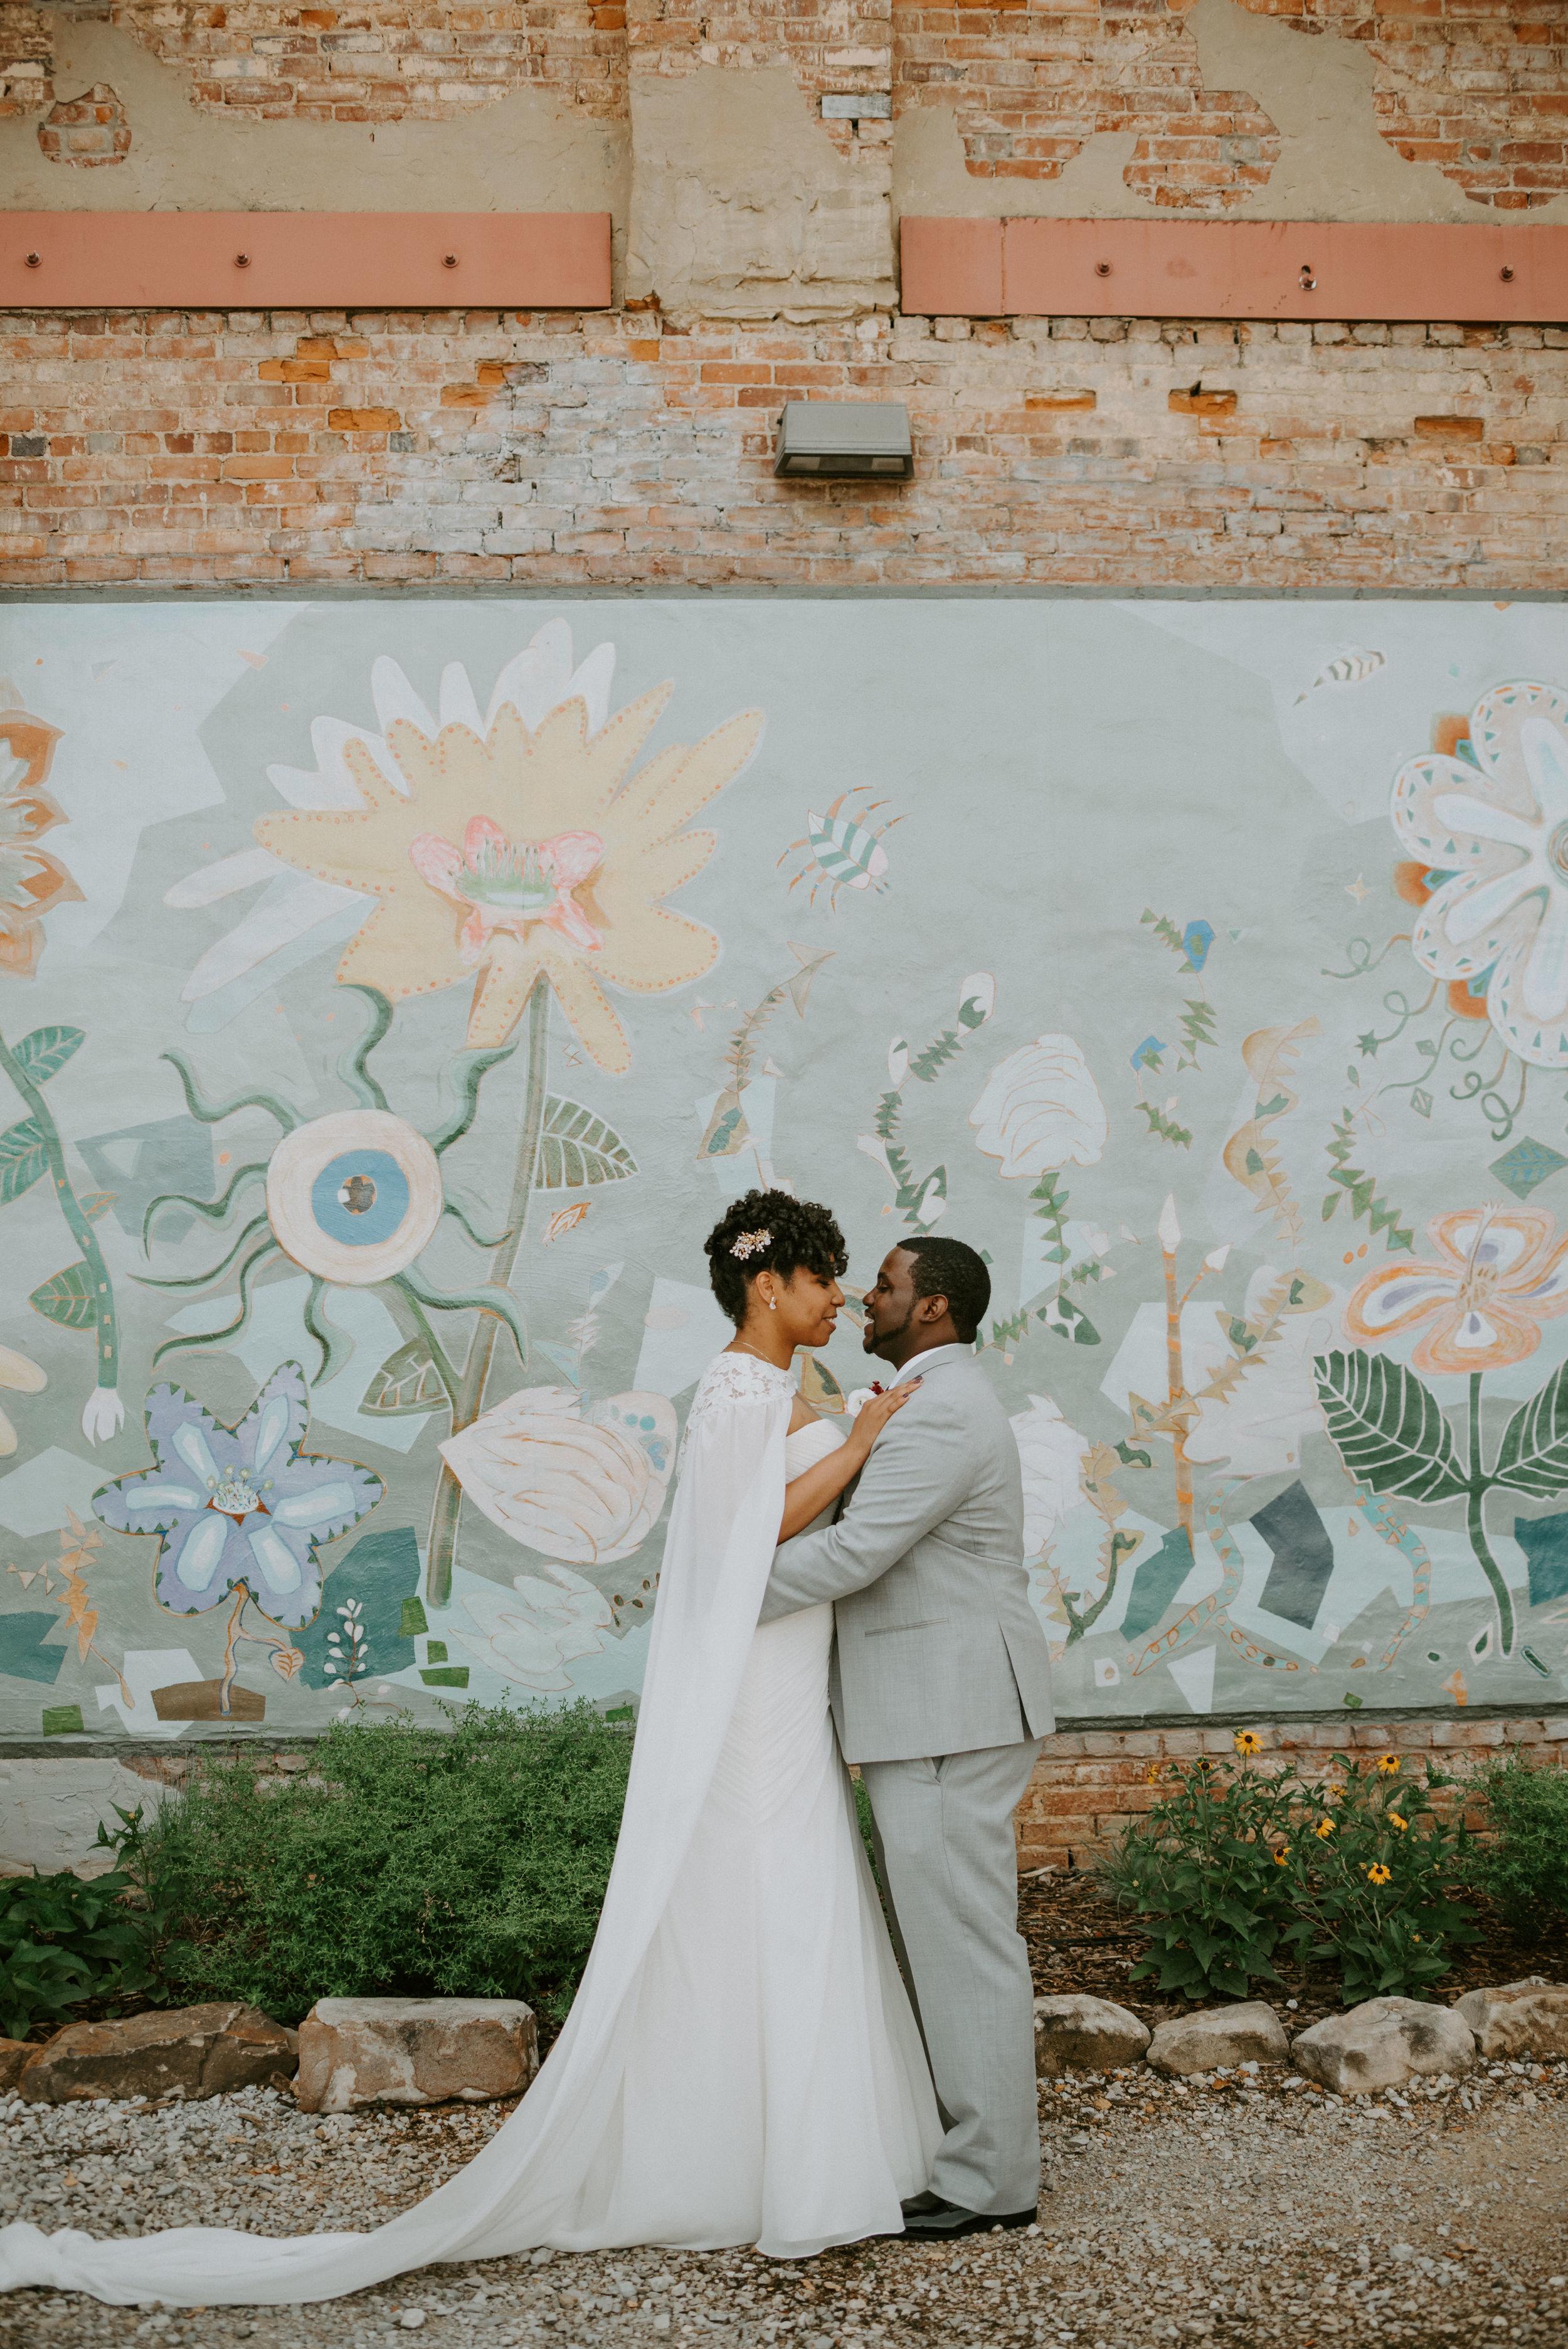 WonderlyCreative_Wedding_6.7.18_Khara&Dwayne_-746.jpg